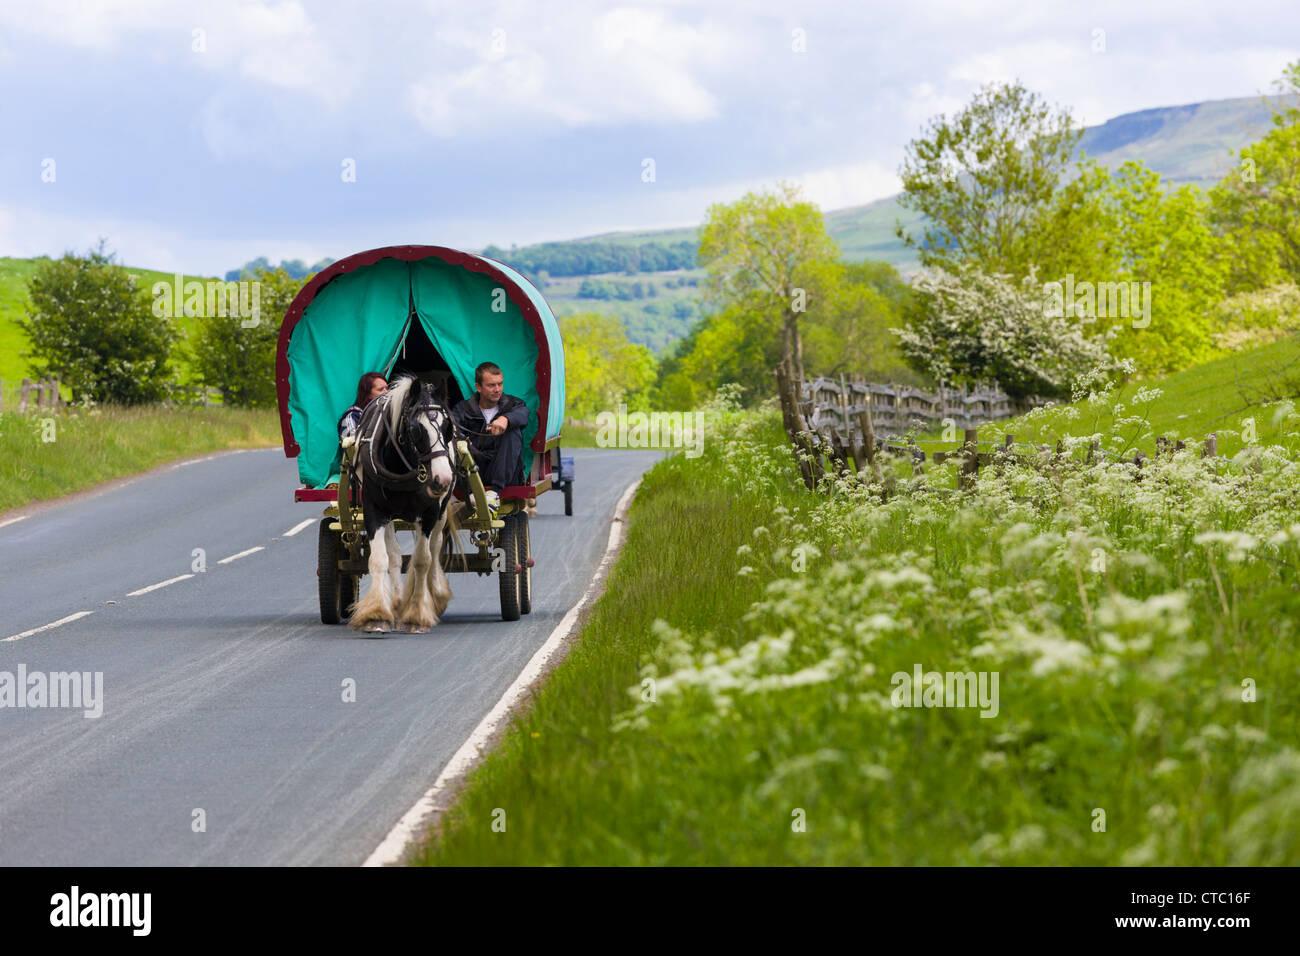 Gypsy caravan, Wharfedale, Yorkshire - Stock Image